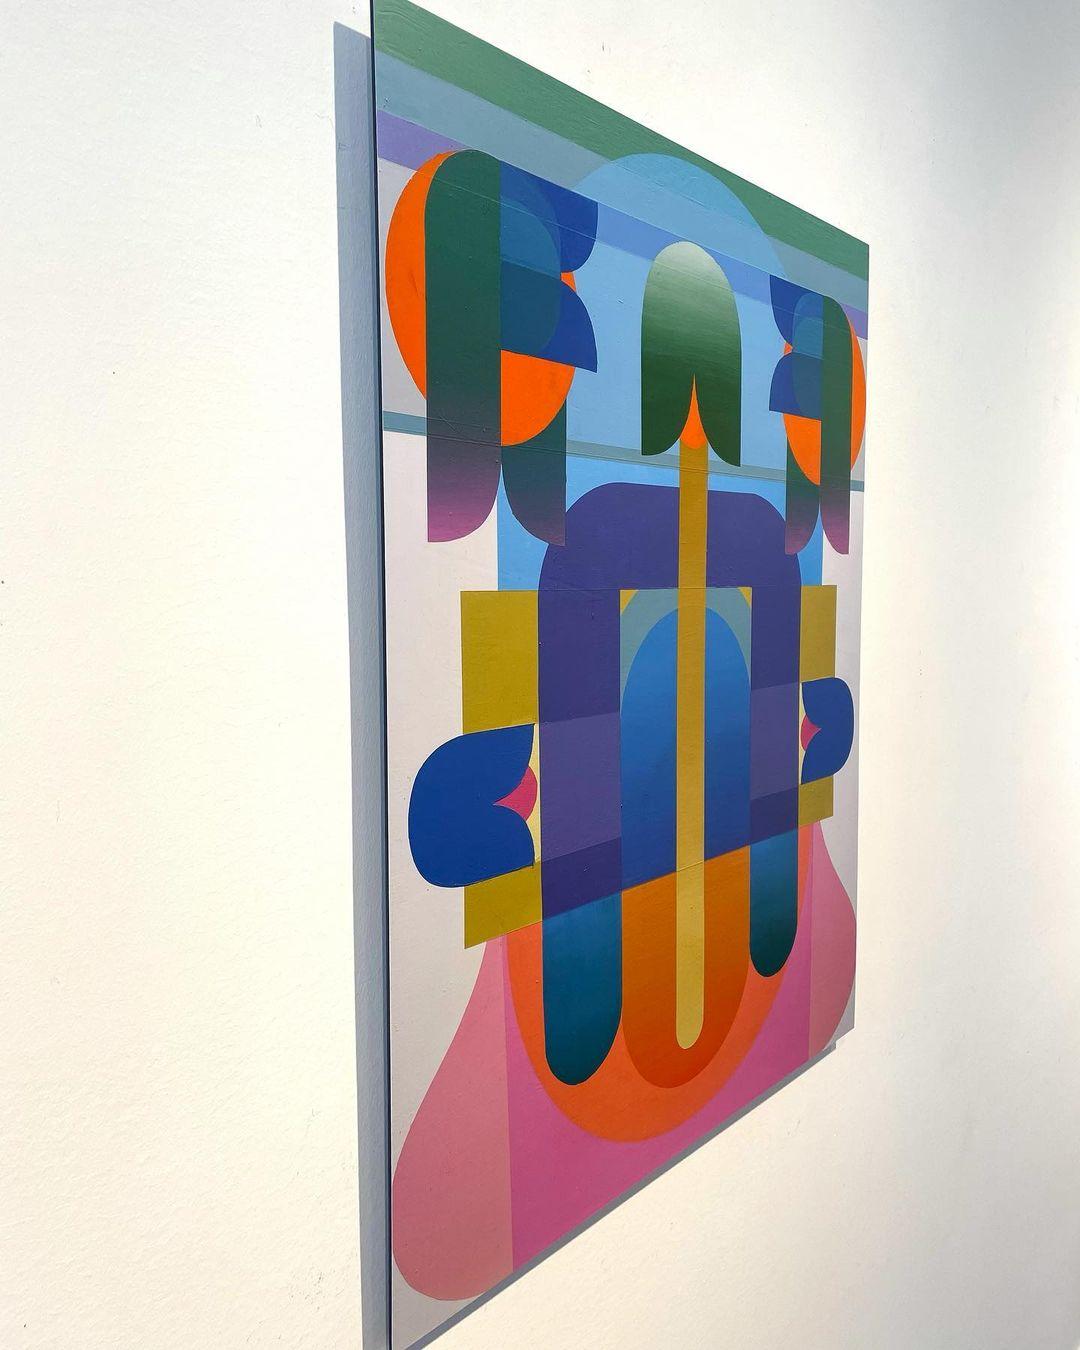 Sarah-Gee-Miller-Optima-2-30x24-Online-Art-Galleries-side-2